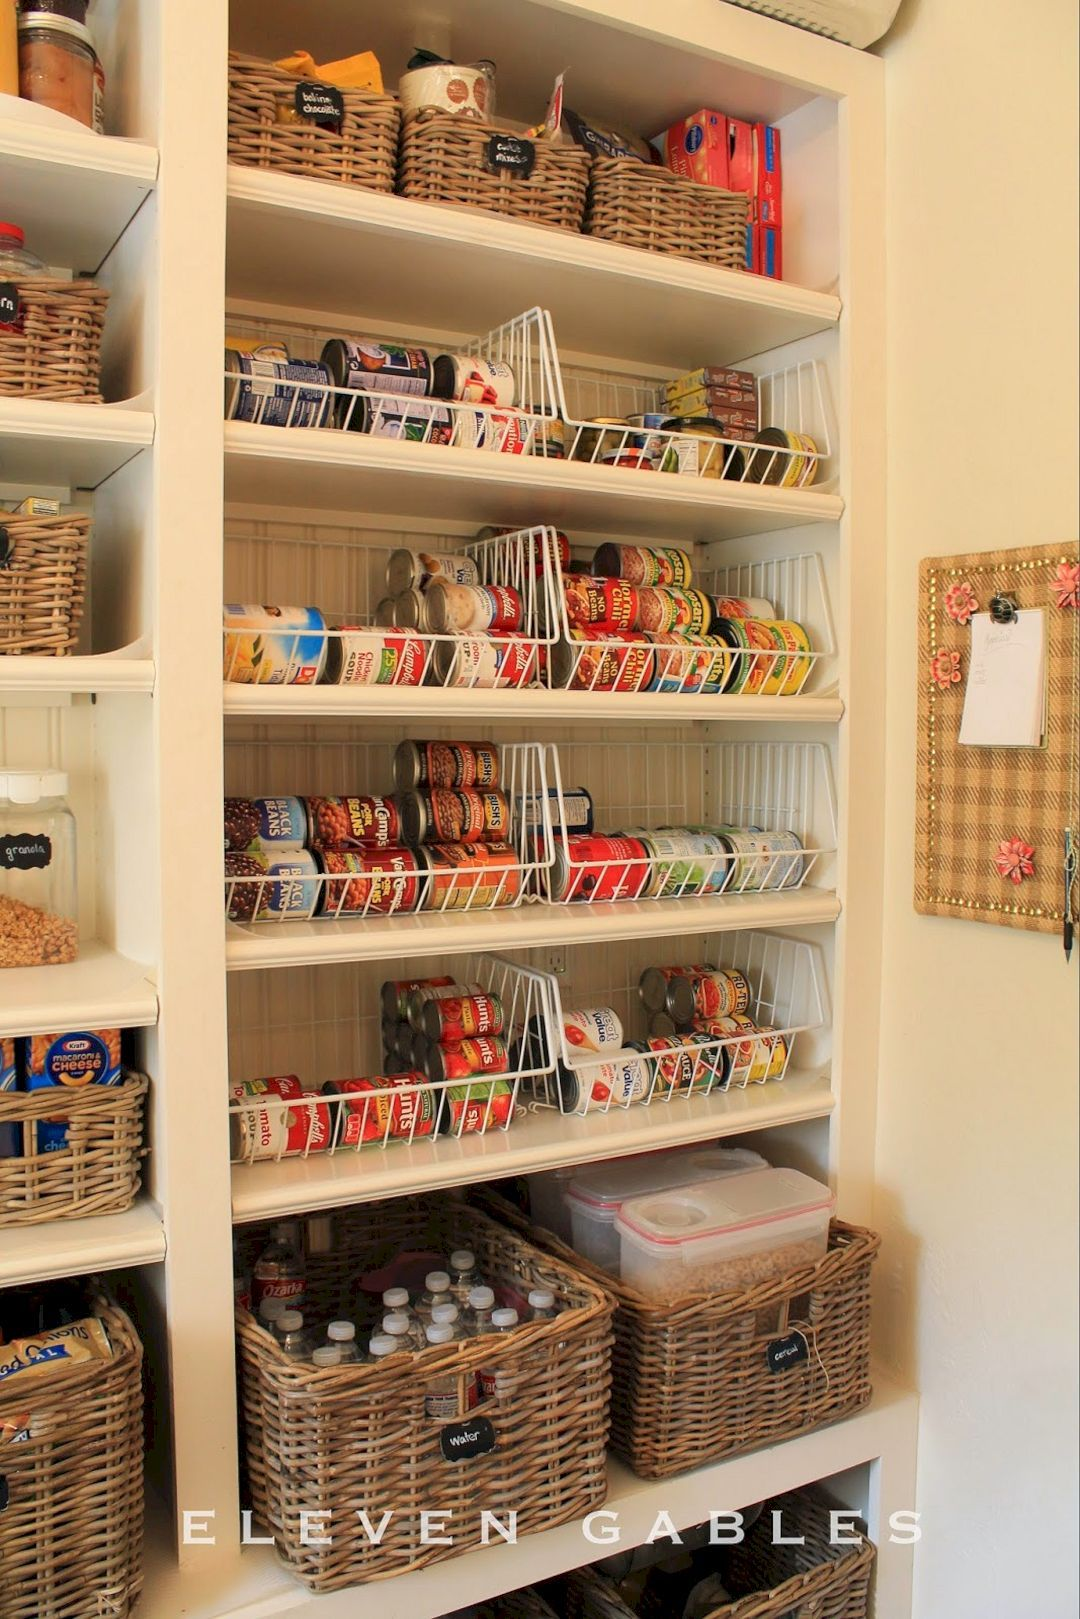 Astonishing Pantry Organization Ideas | Pinterest | Häuschen und Ideen